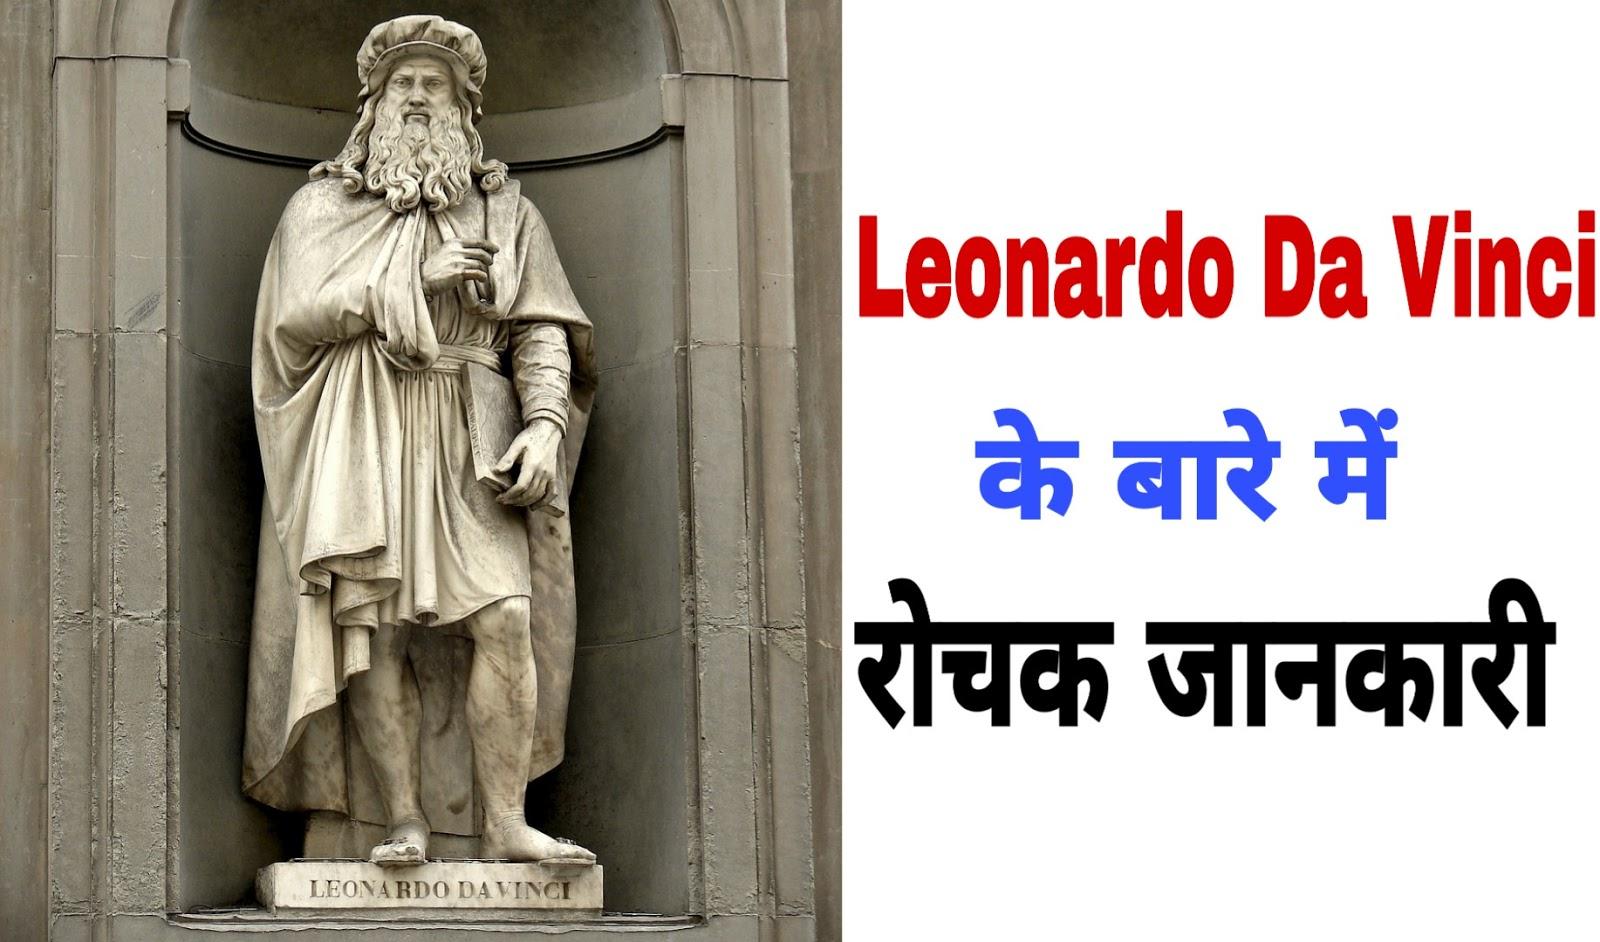 लिओनार्दो दा विंची का जीवन परिचय और रोचक तथ्य - Information and Facts about Leonardo DA Vinci in Hindi